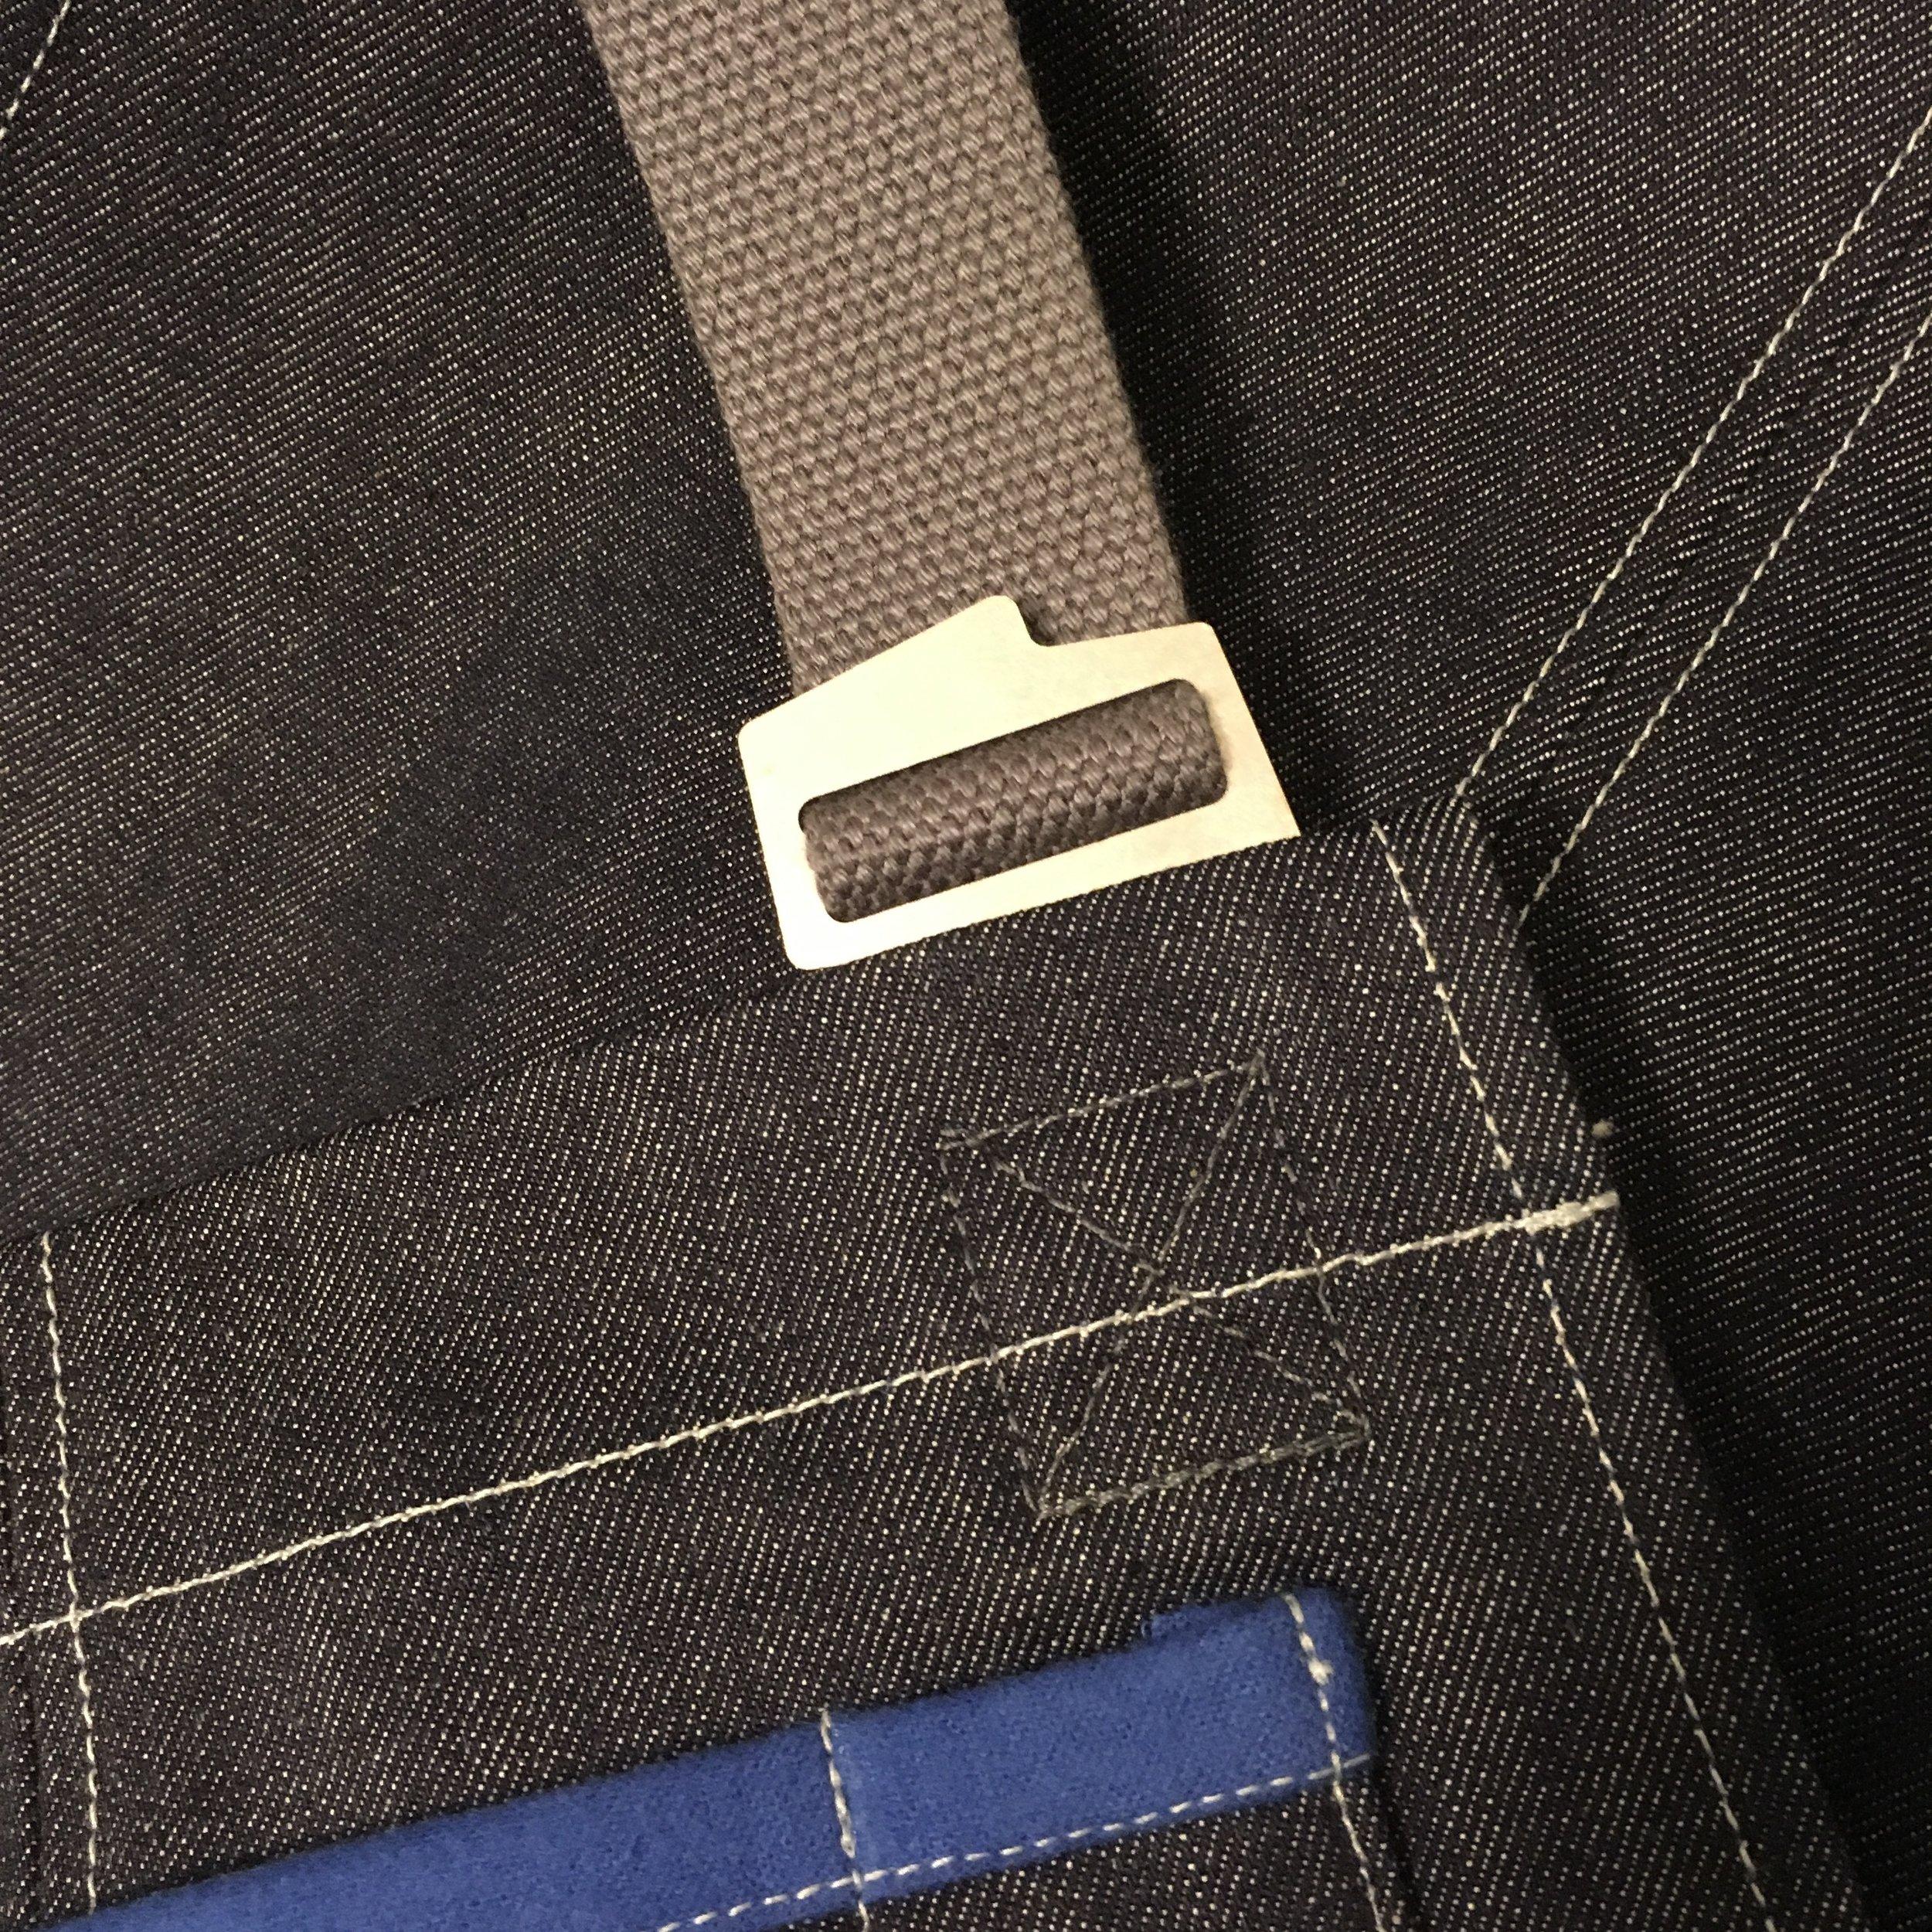 American Denim Apron - stainless hardware